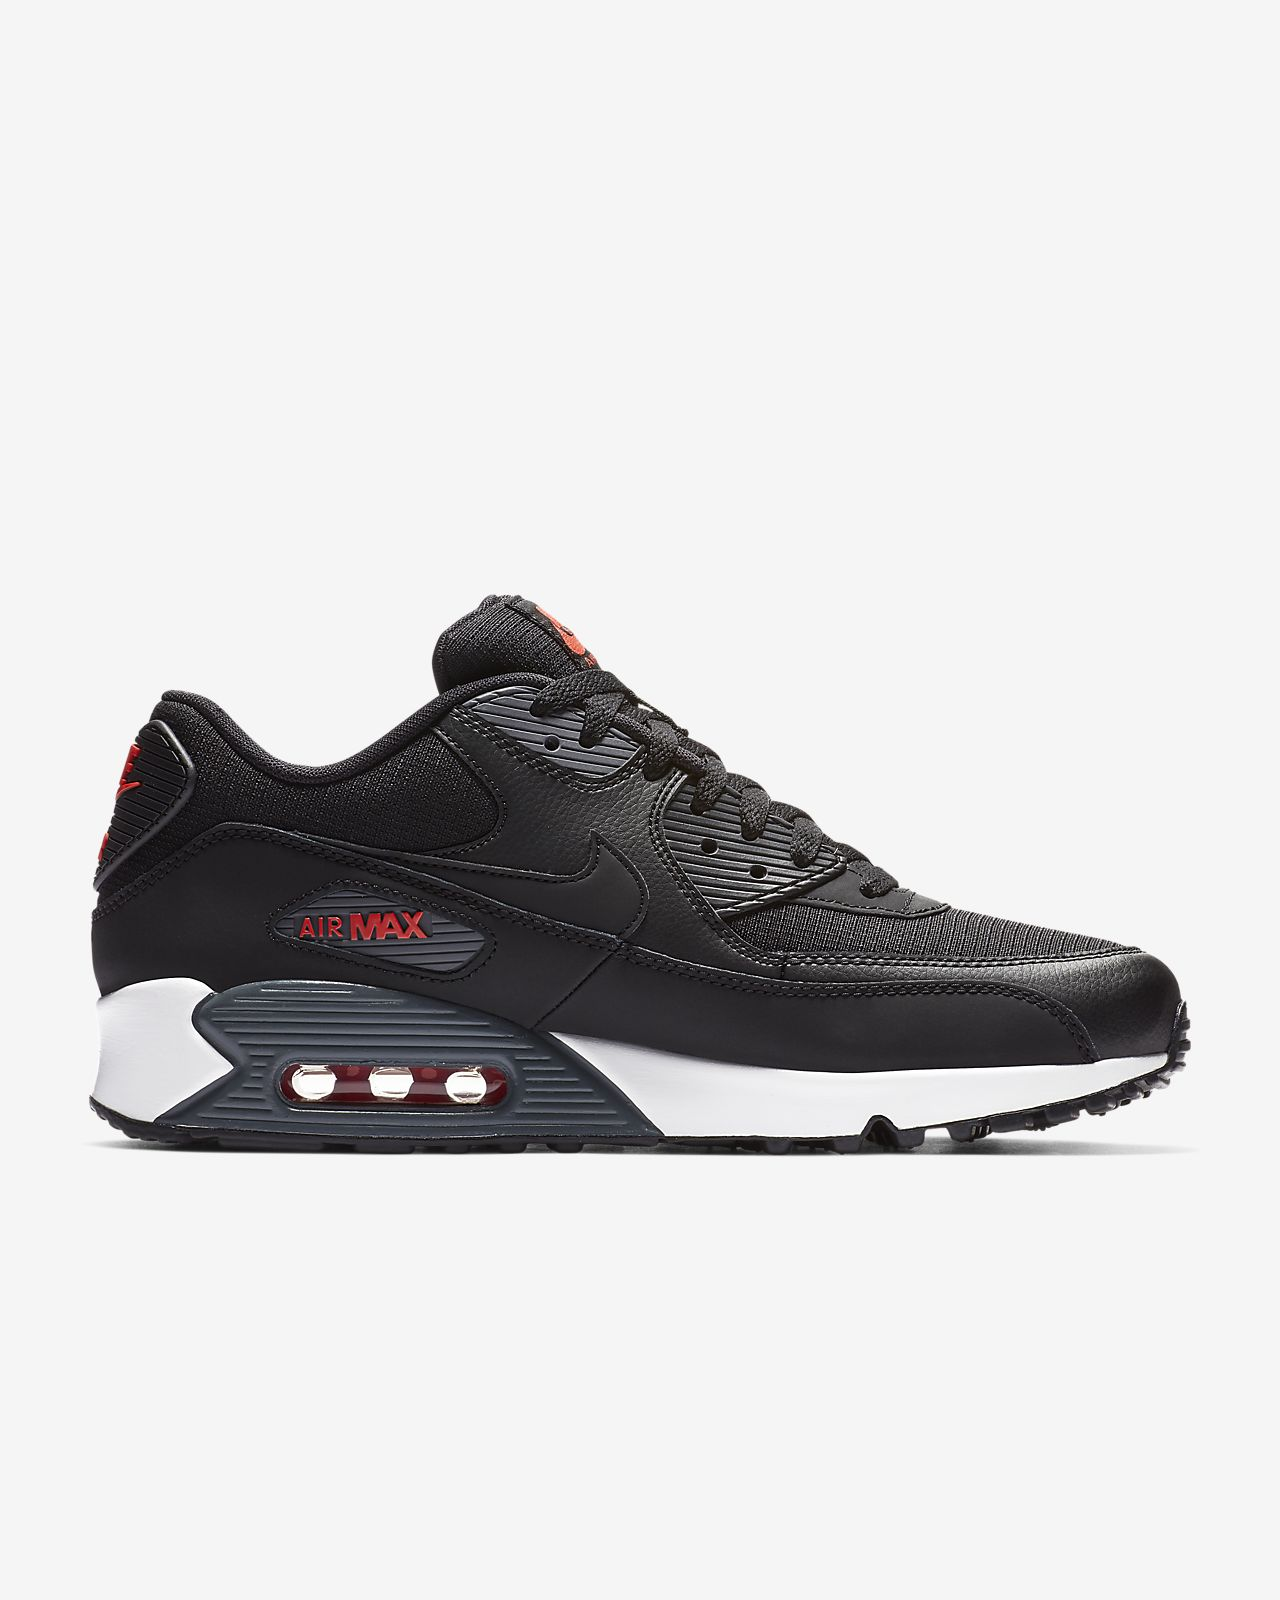 286cccd47093 Nike Air Max 90 SE Men s Shoe. Nike.com IE